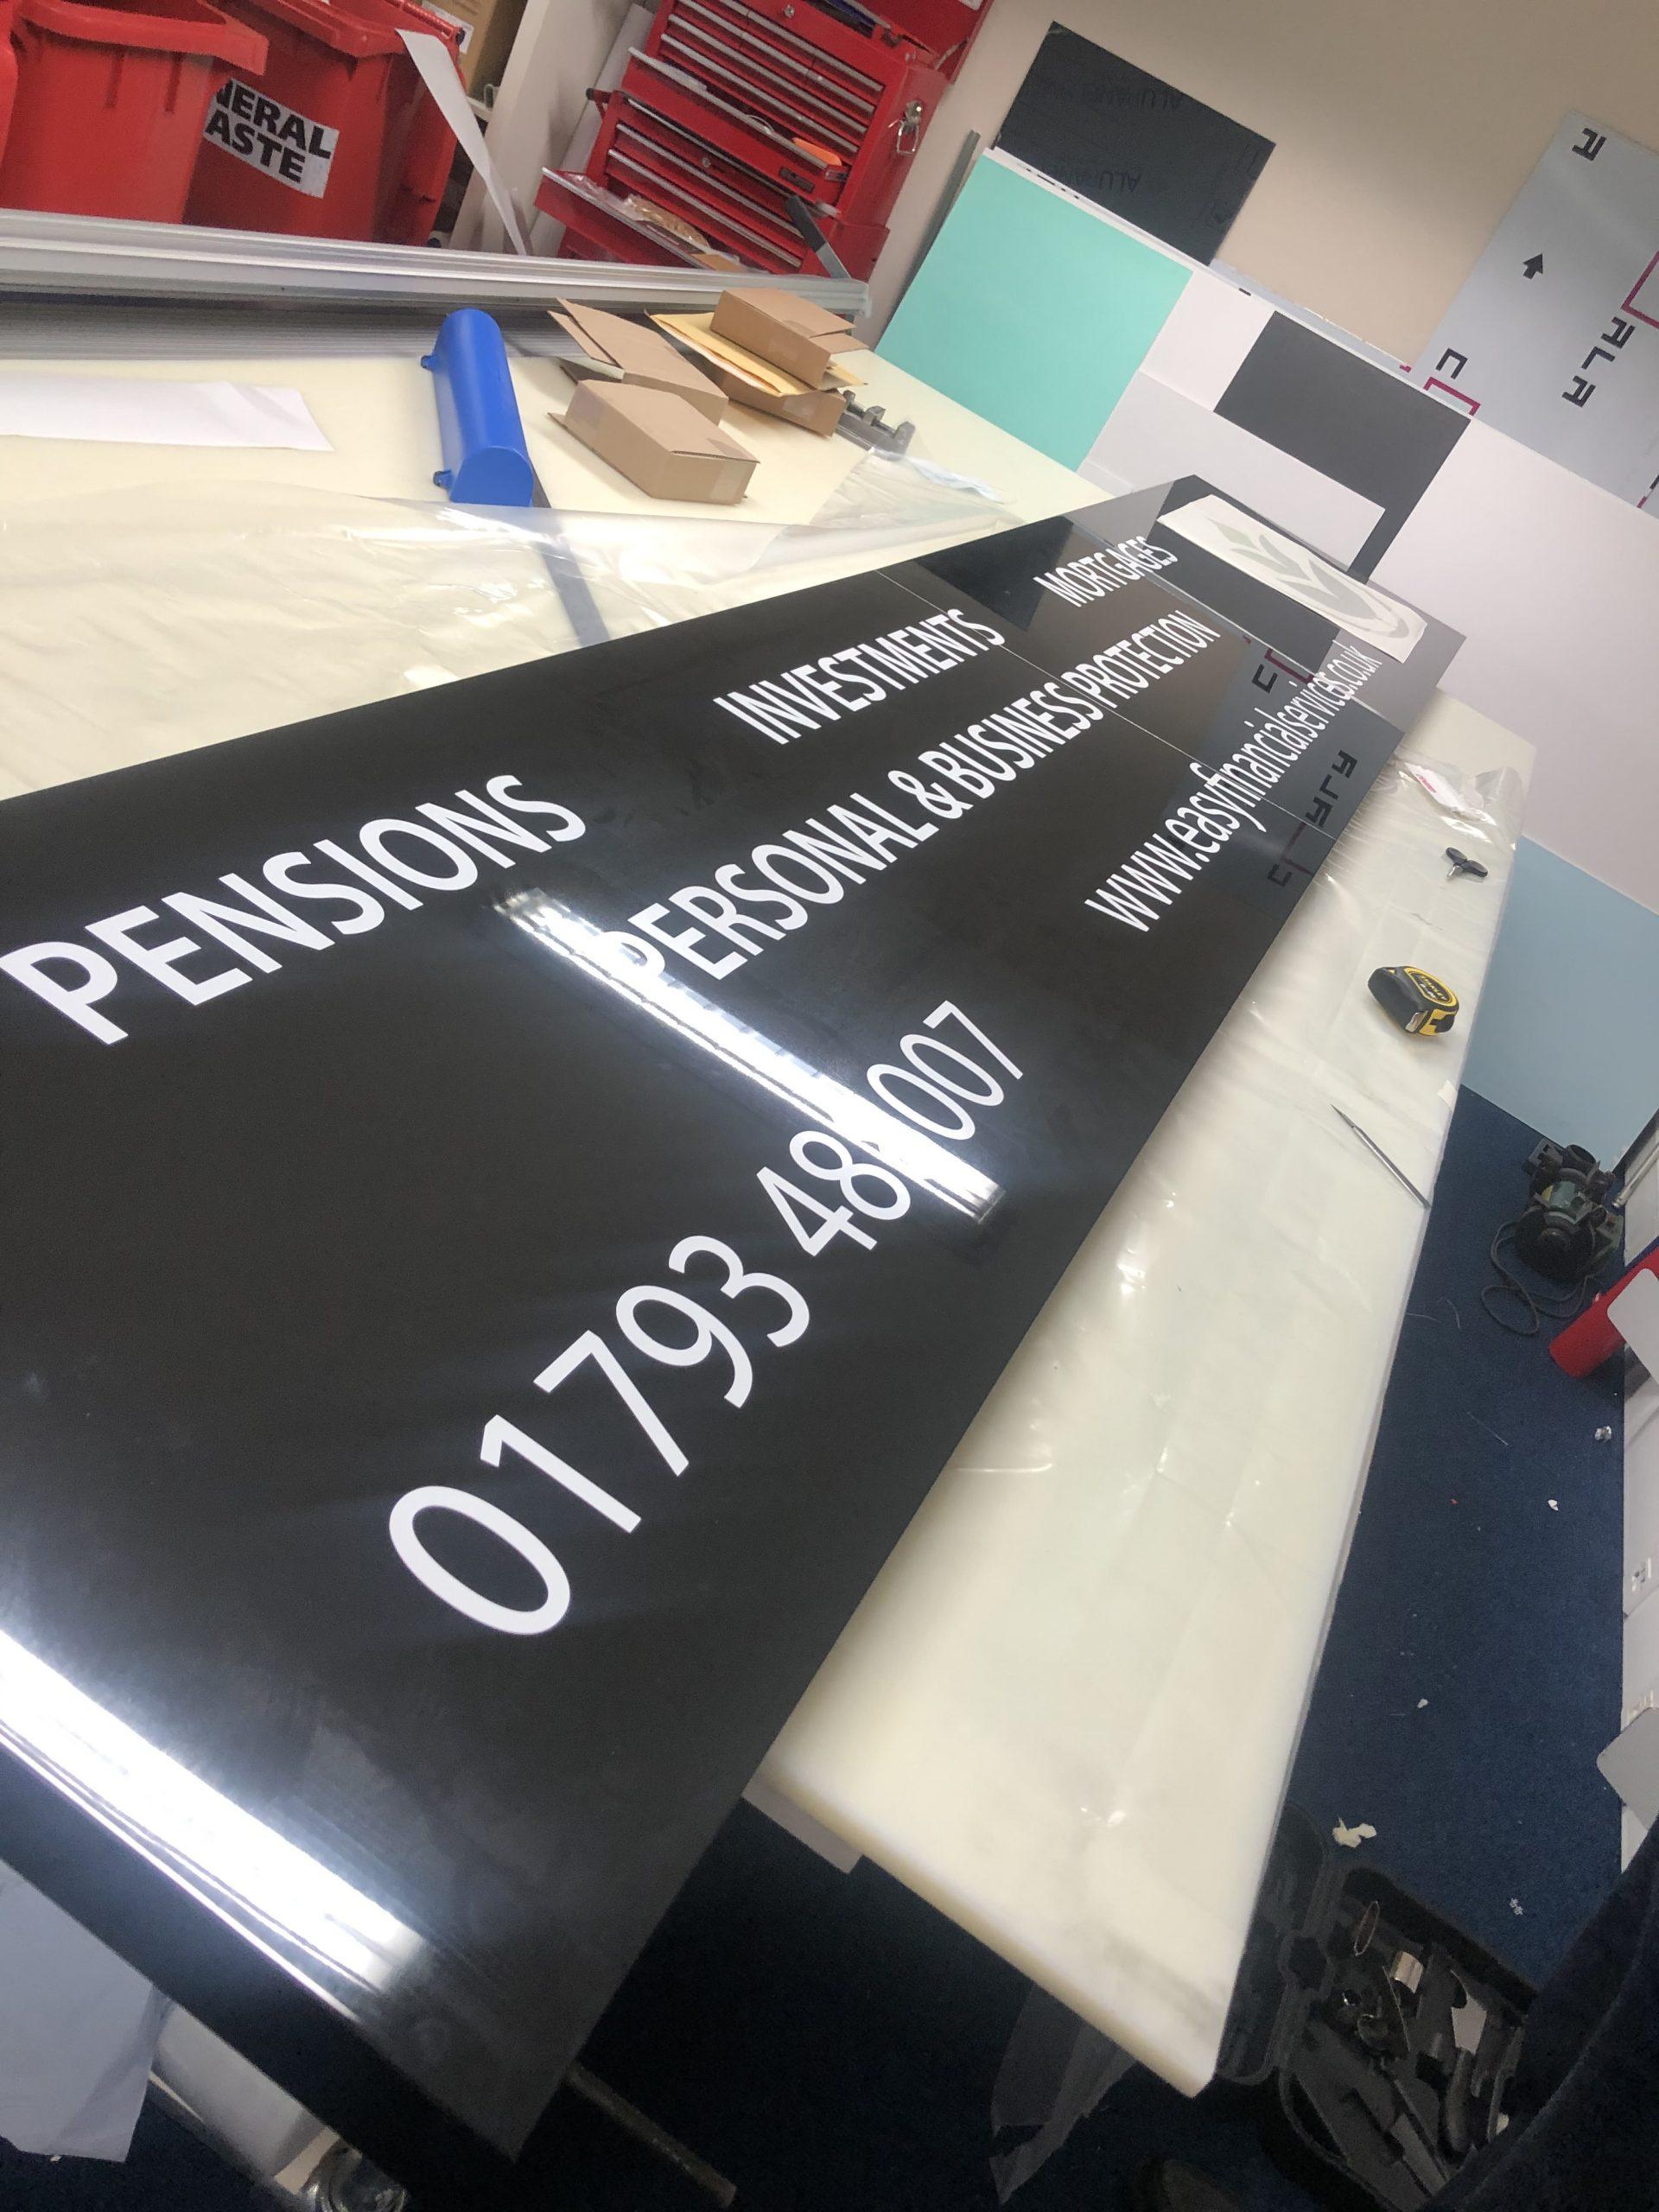 https://studio-cs.co.uk/project/internal-external-office-signage